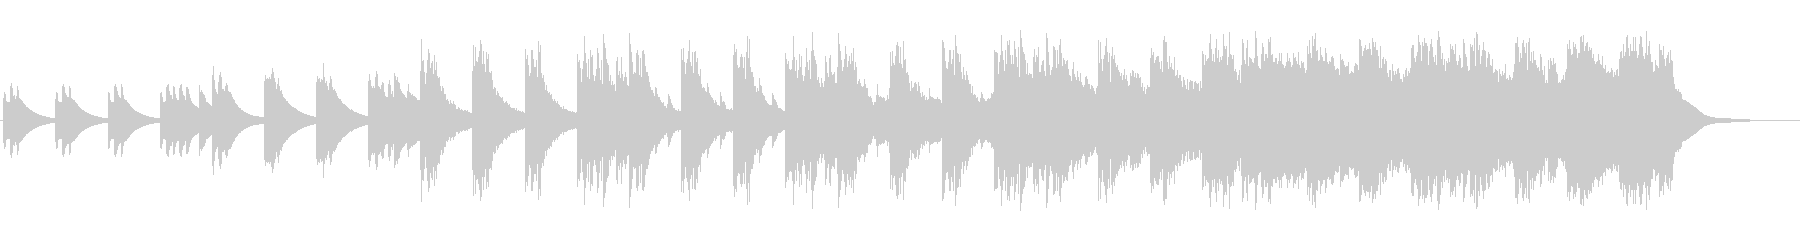 α波が出そうな音を寄せ集めたリラックス曲の未再生の波形